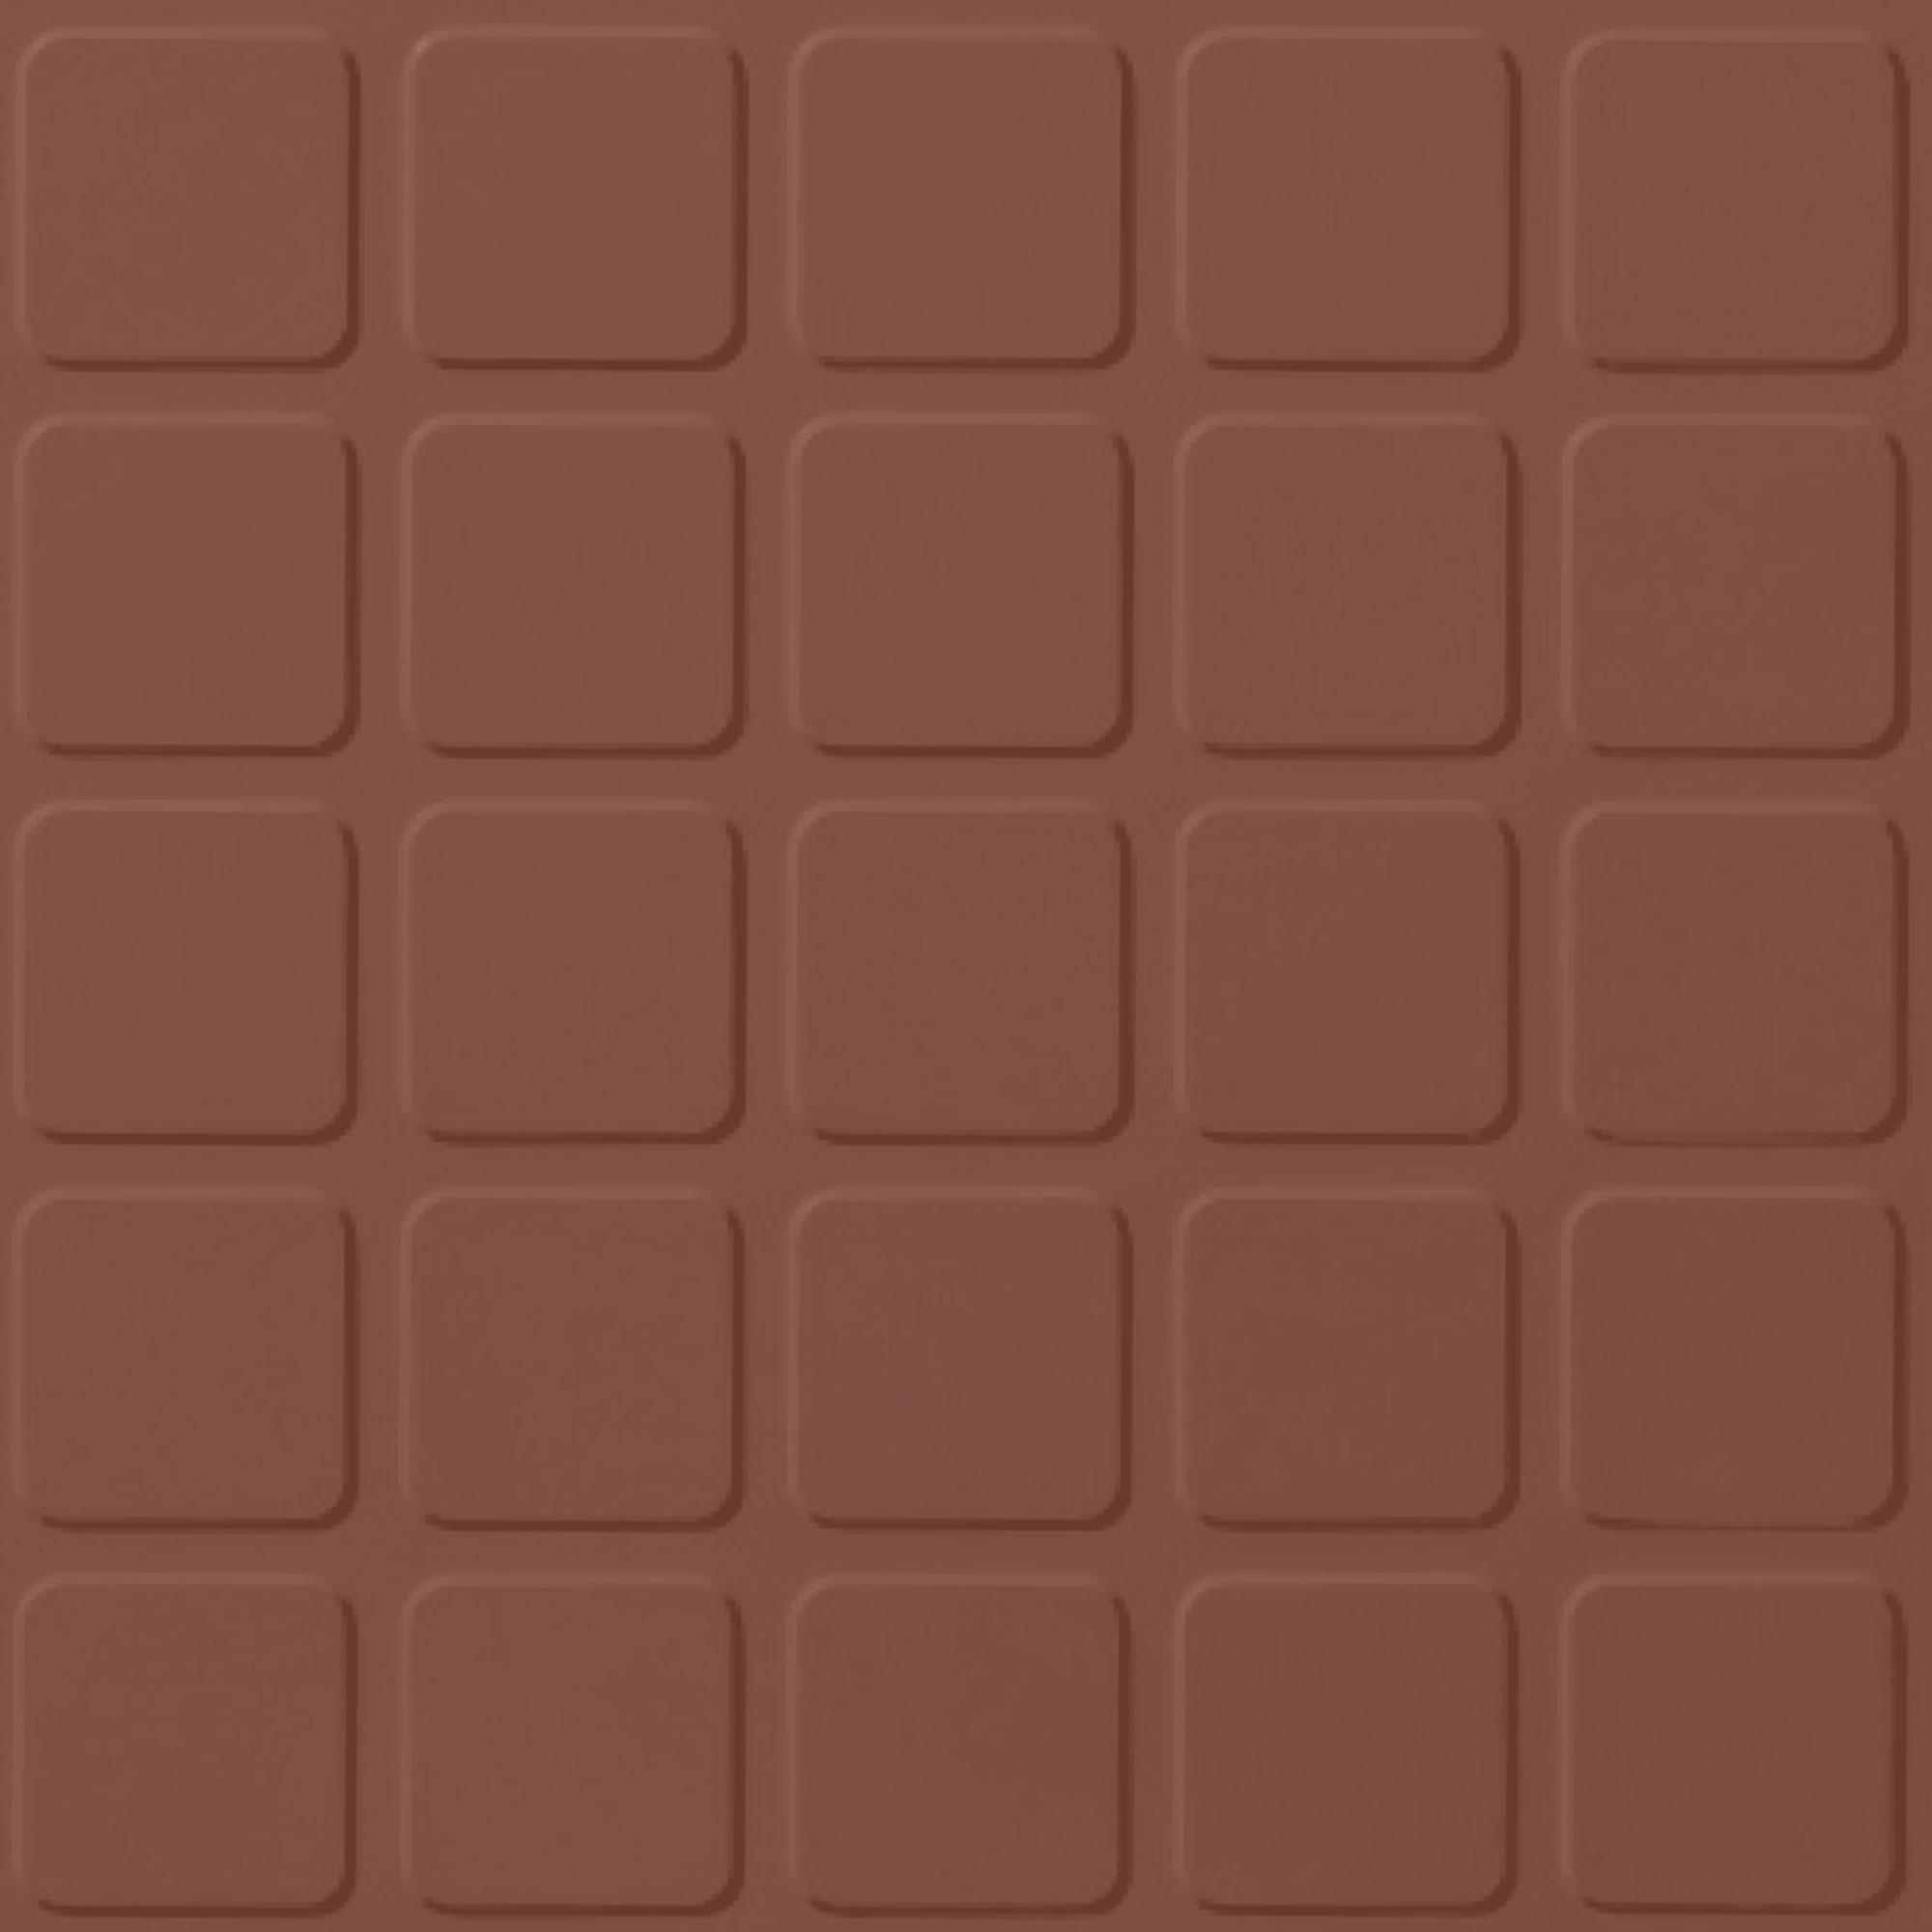 Roppe Rubber Tile 900 - Raised Square Design (994) Brick Rubber Flooring